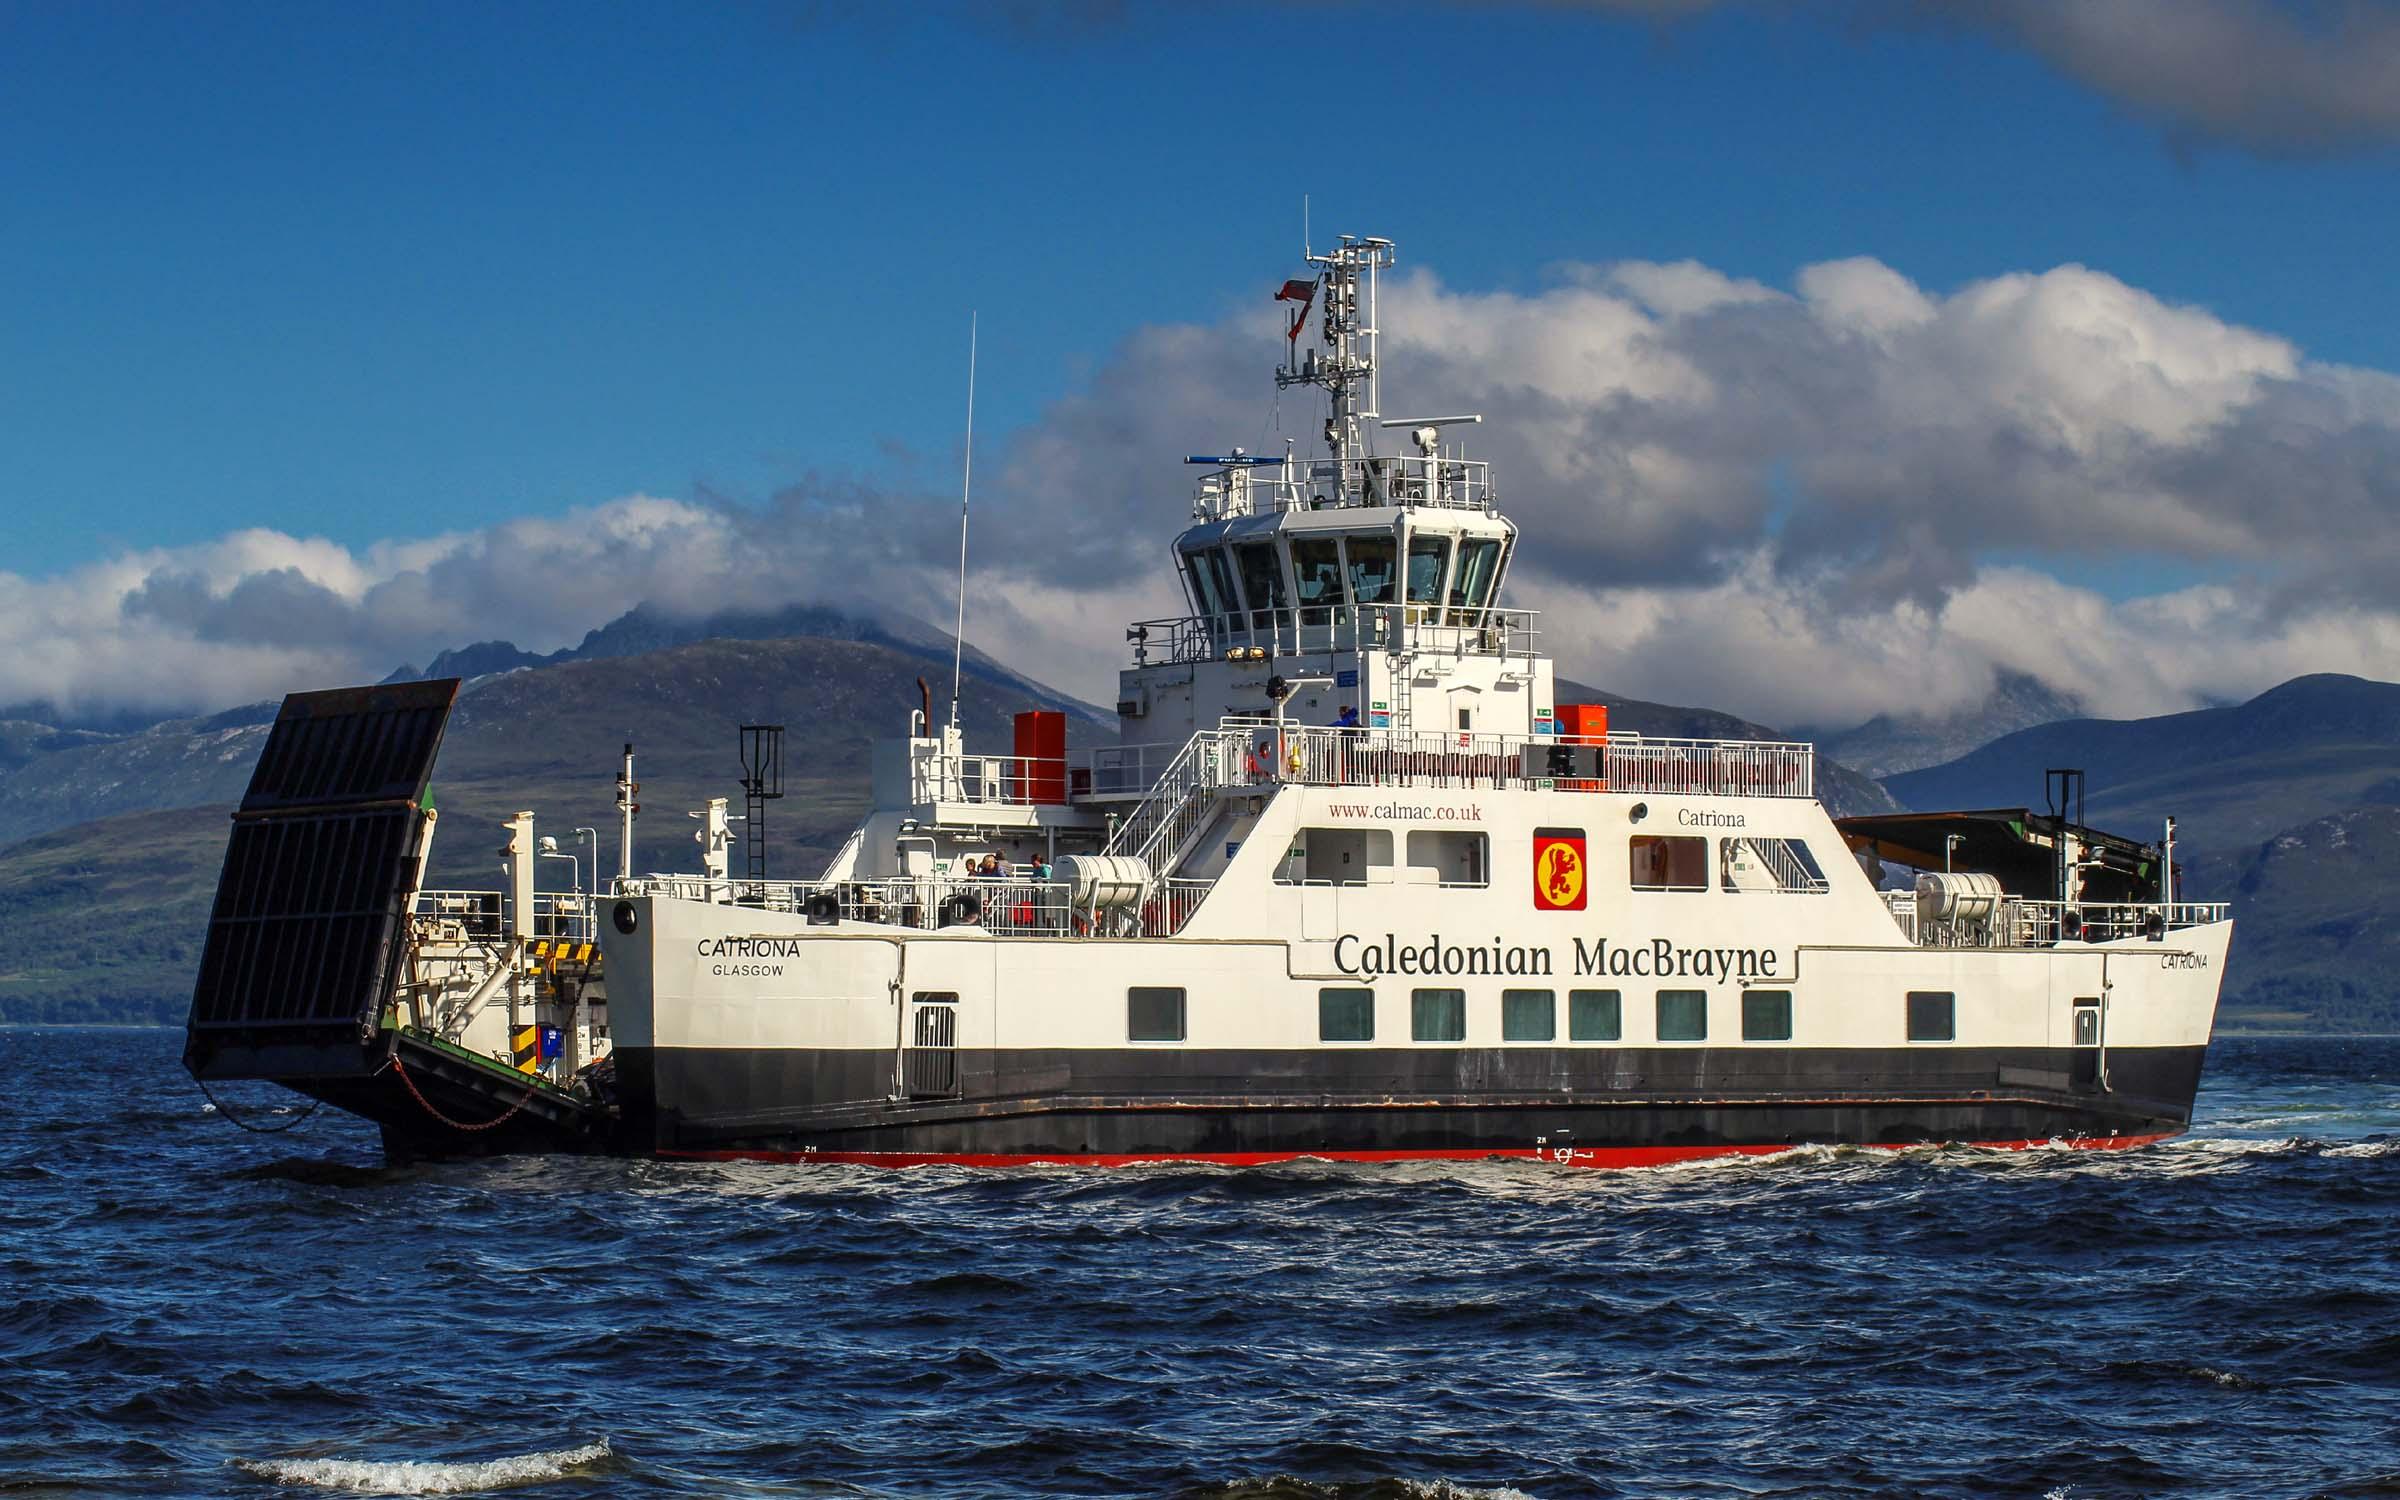 Catriona arriving at Claonaig (Ships of CalMac)